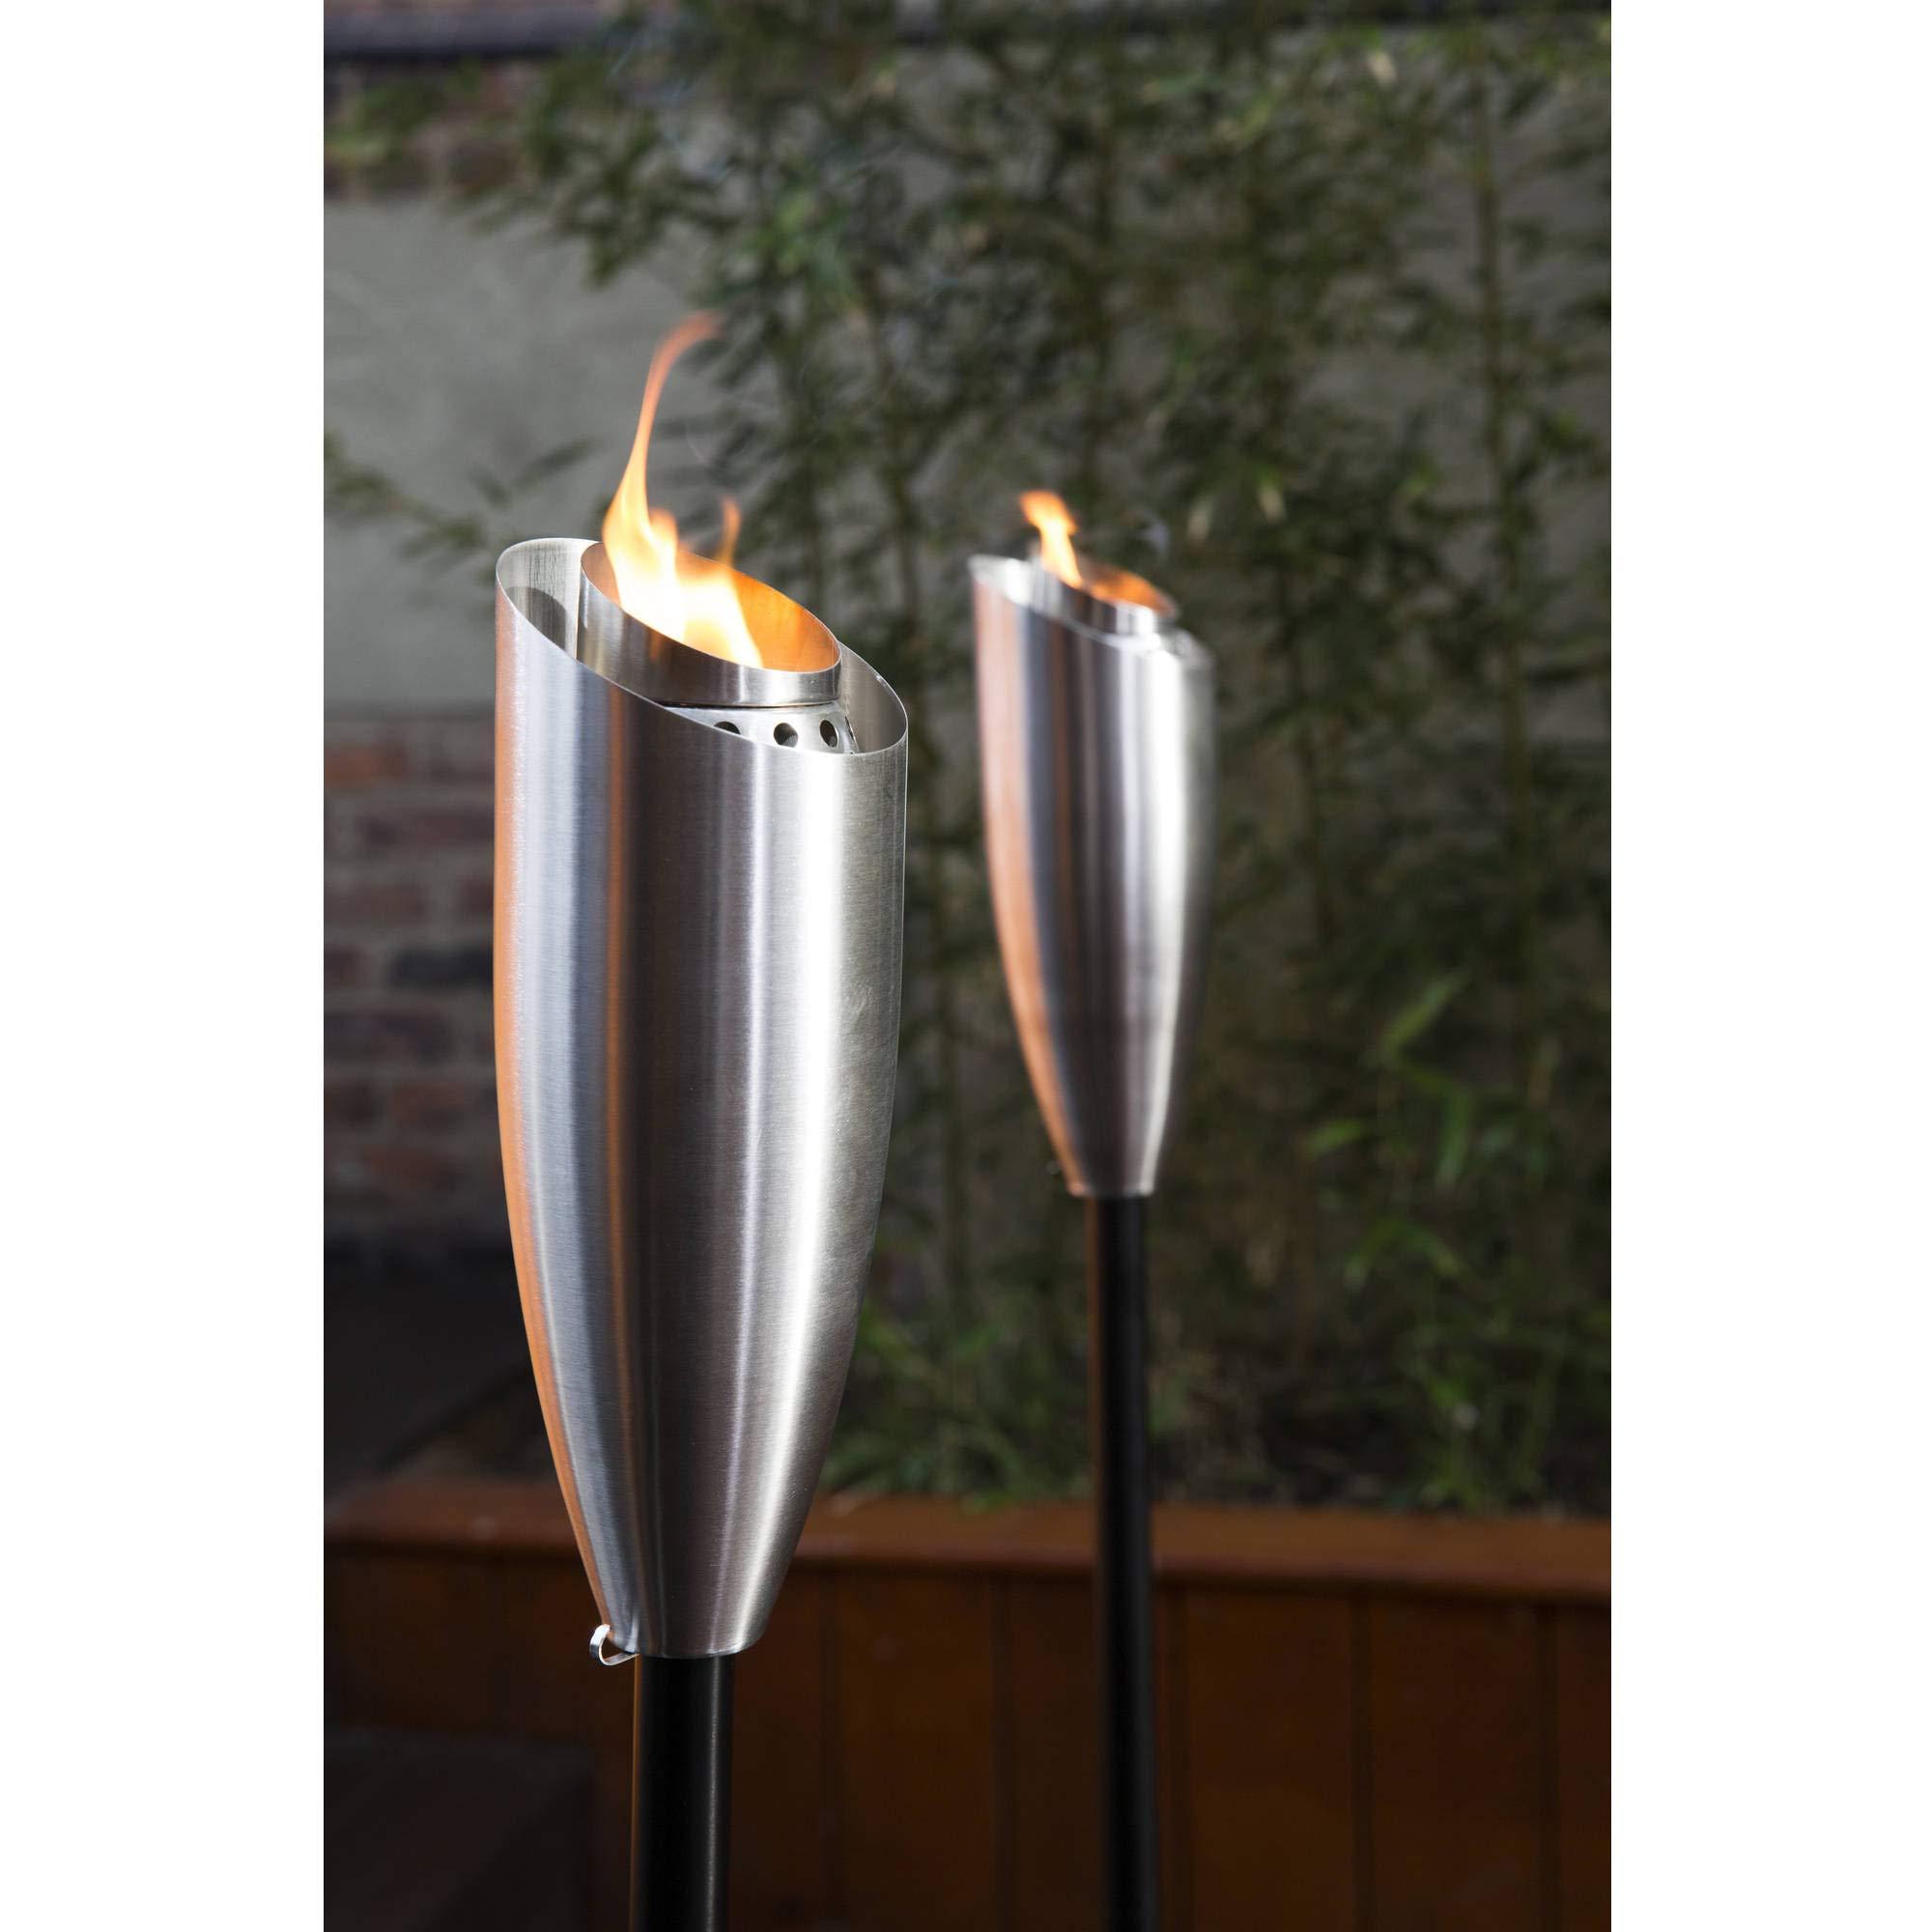 Jur_Global Brand Stainless Steel Torch